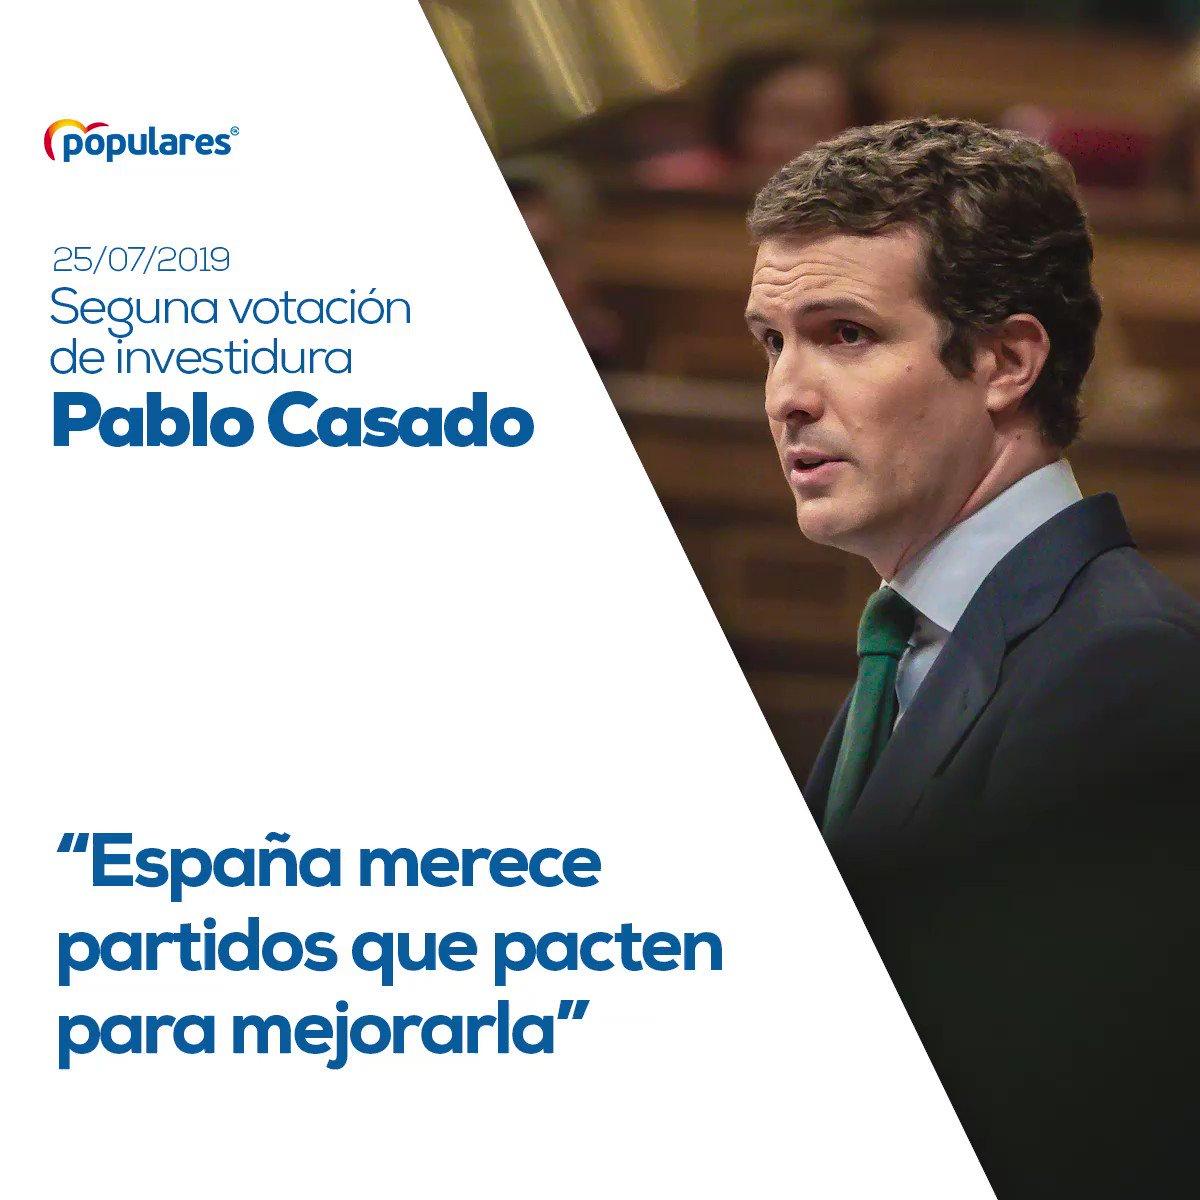 🇪🇸 España merece partidos que pacten para mejorarla, no para destruirla. España necesita un presidente, no un mercader. #SánchezFracasa